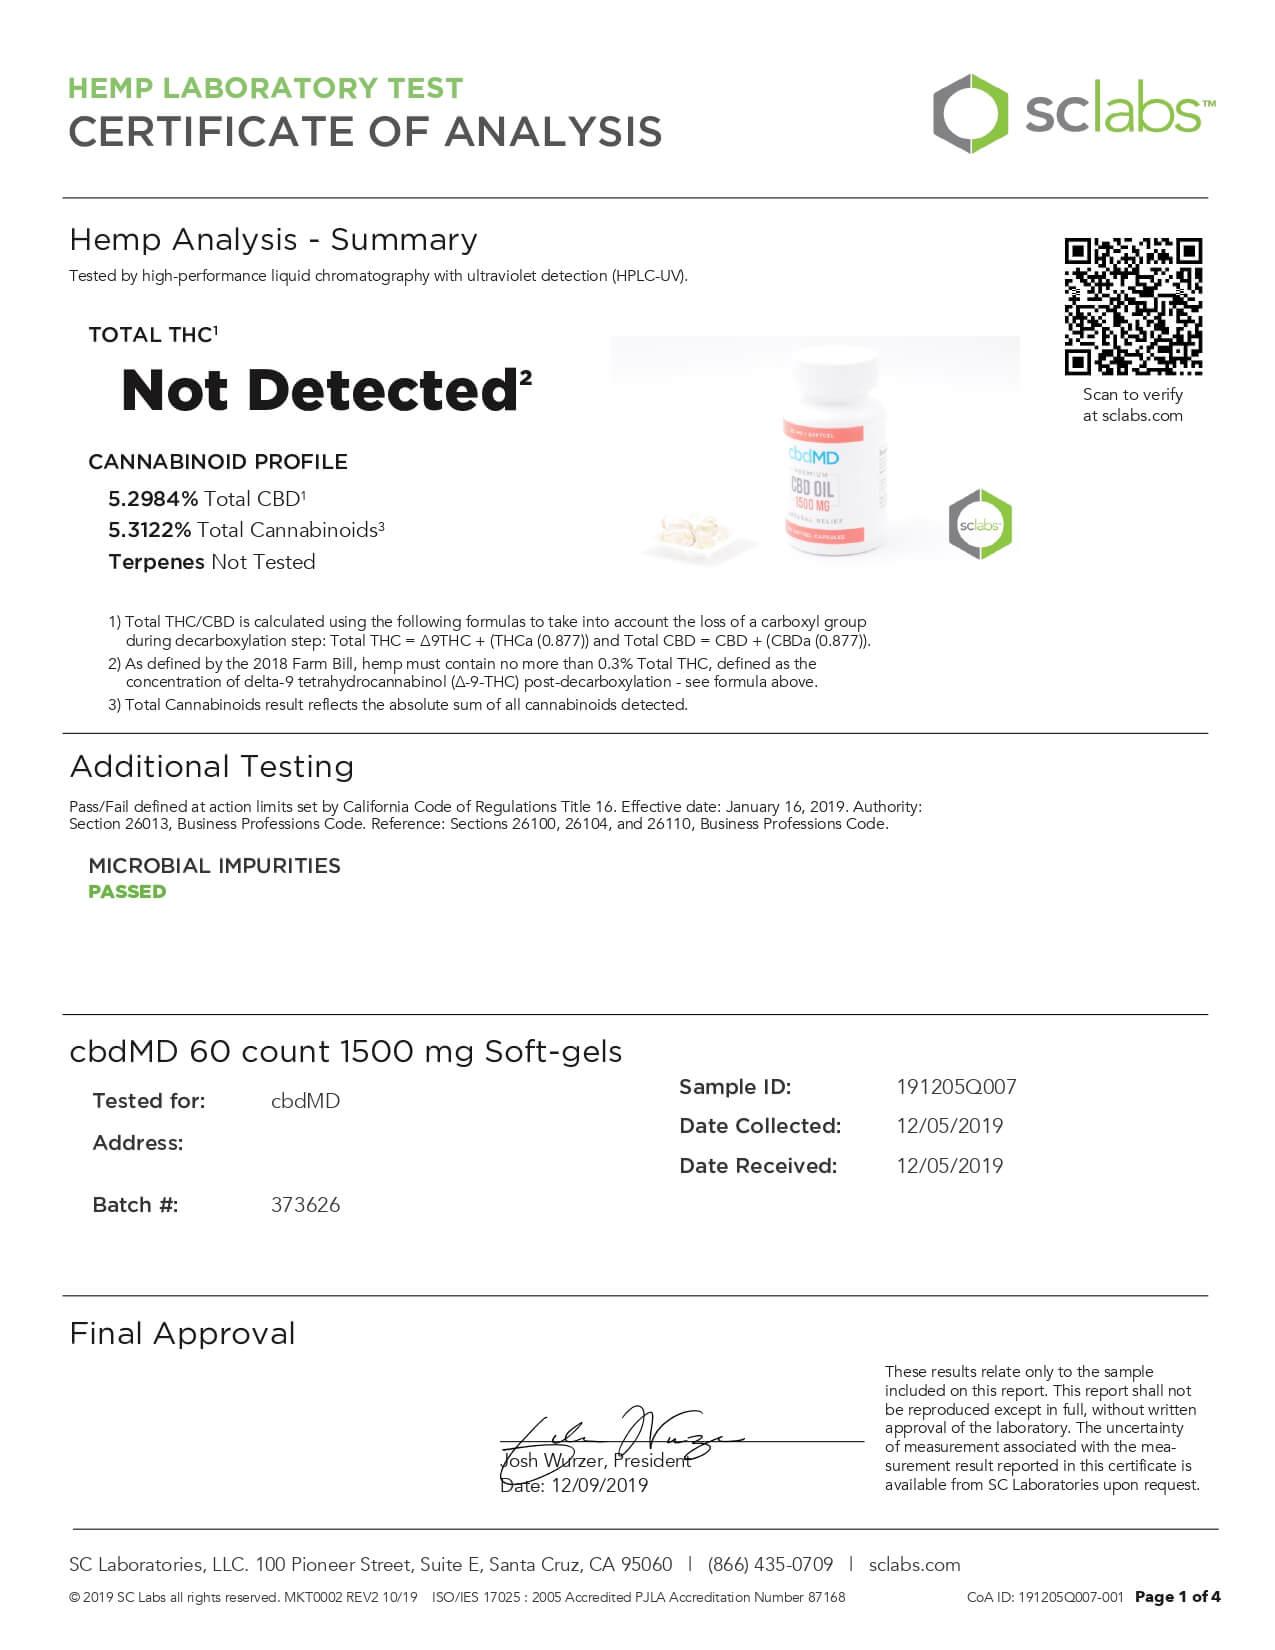 cbdMD CBD Softgels Cbd Oil Softgel Capsules 60ct 500mg Lab Report